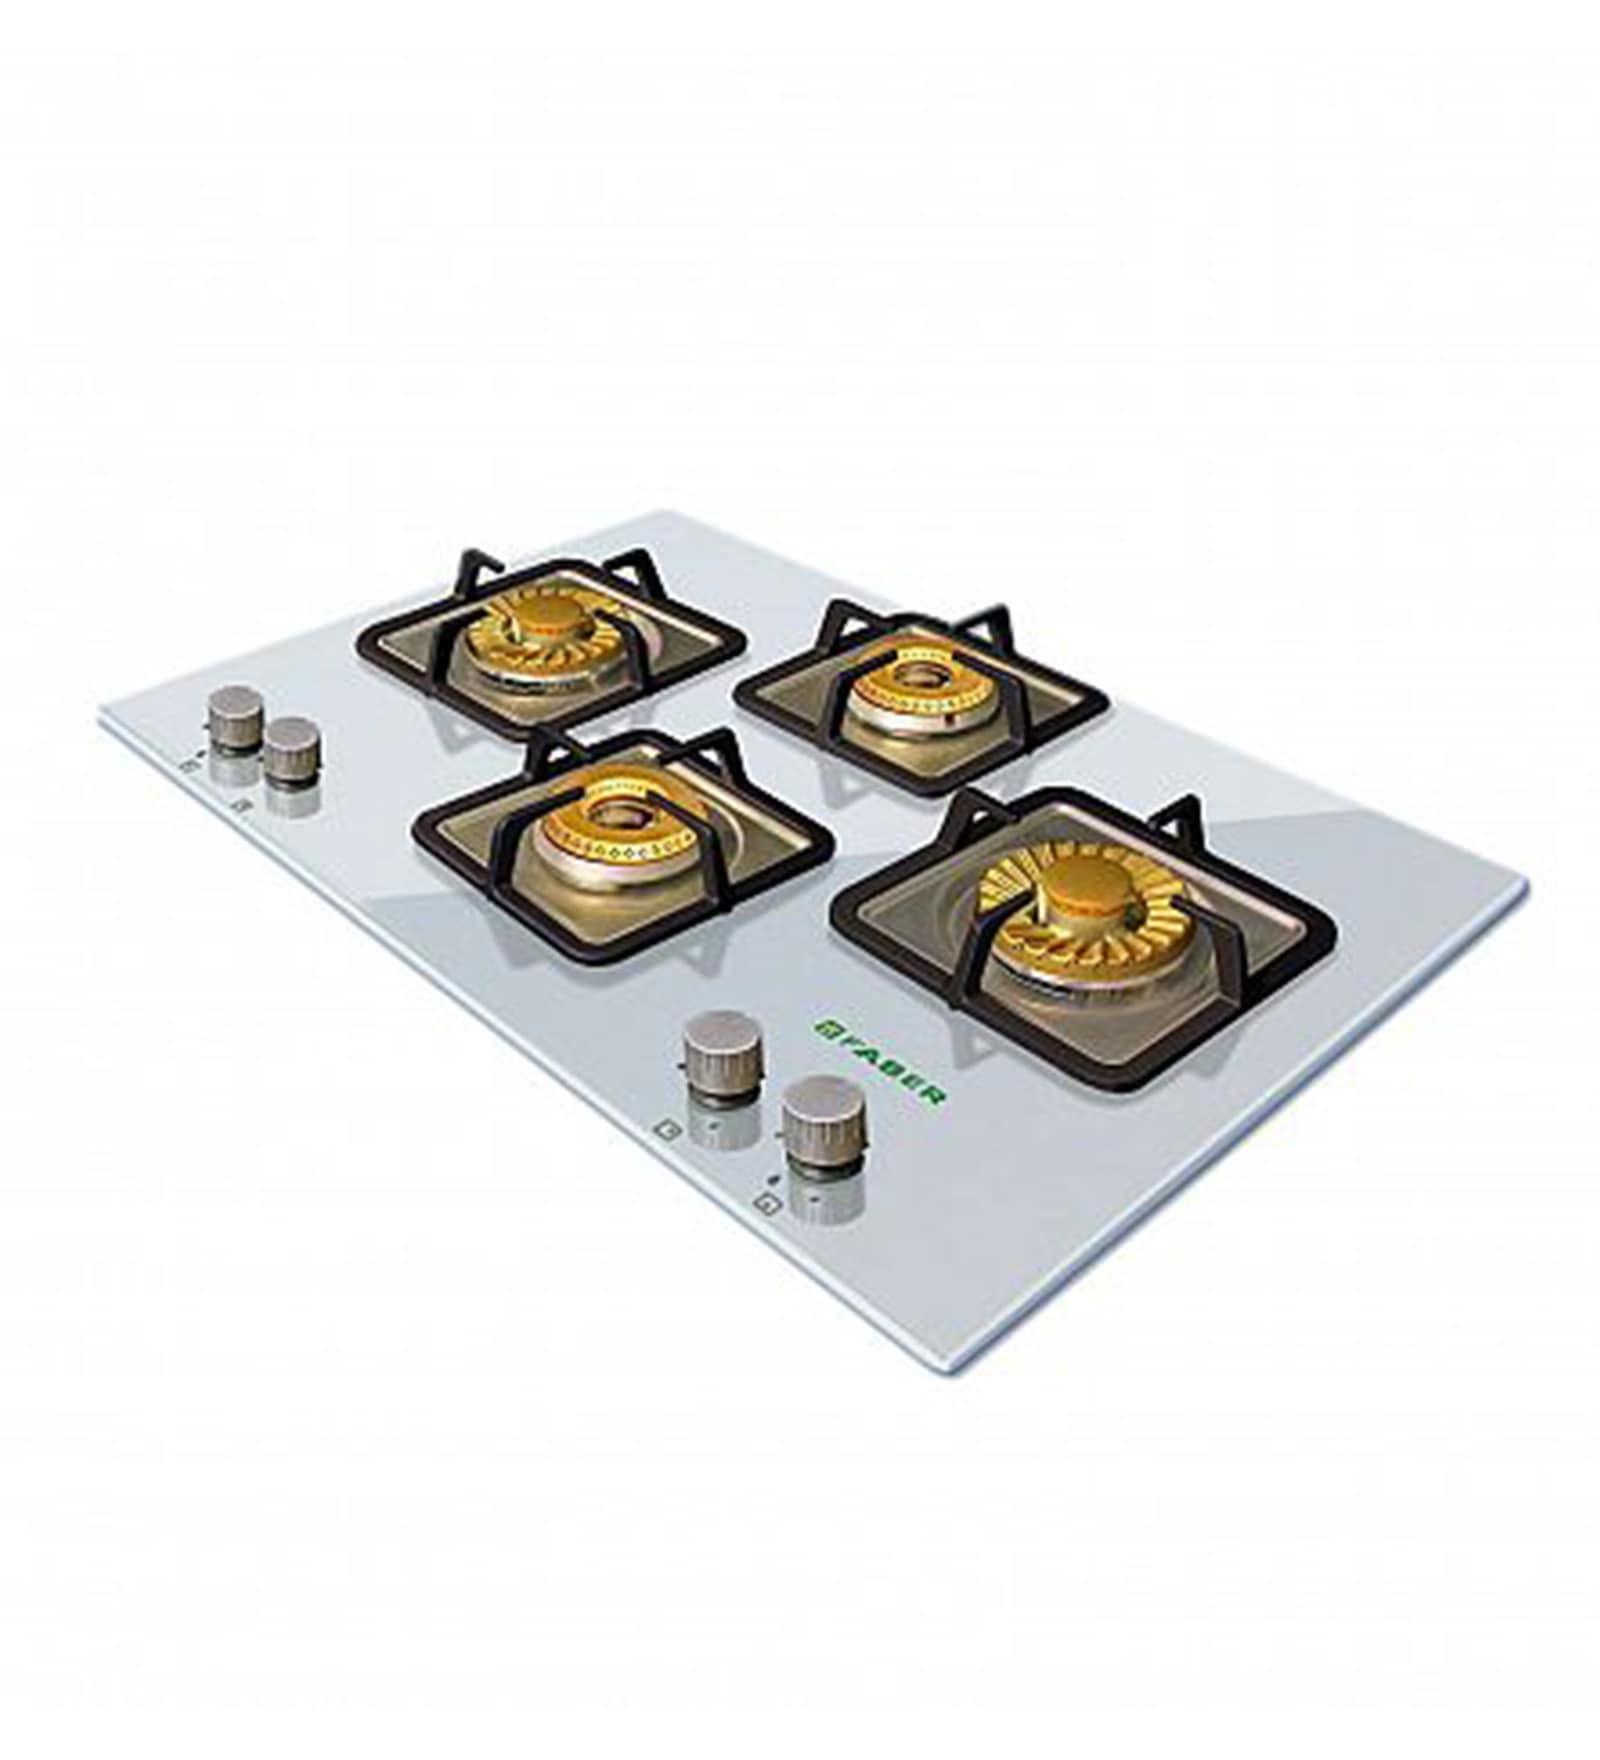 Faber Brass and Glass 4-burner Glasstop Hob (Model: HGG 754CRS BR CI)